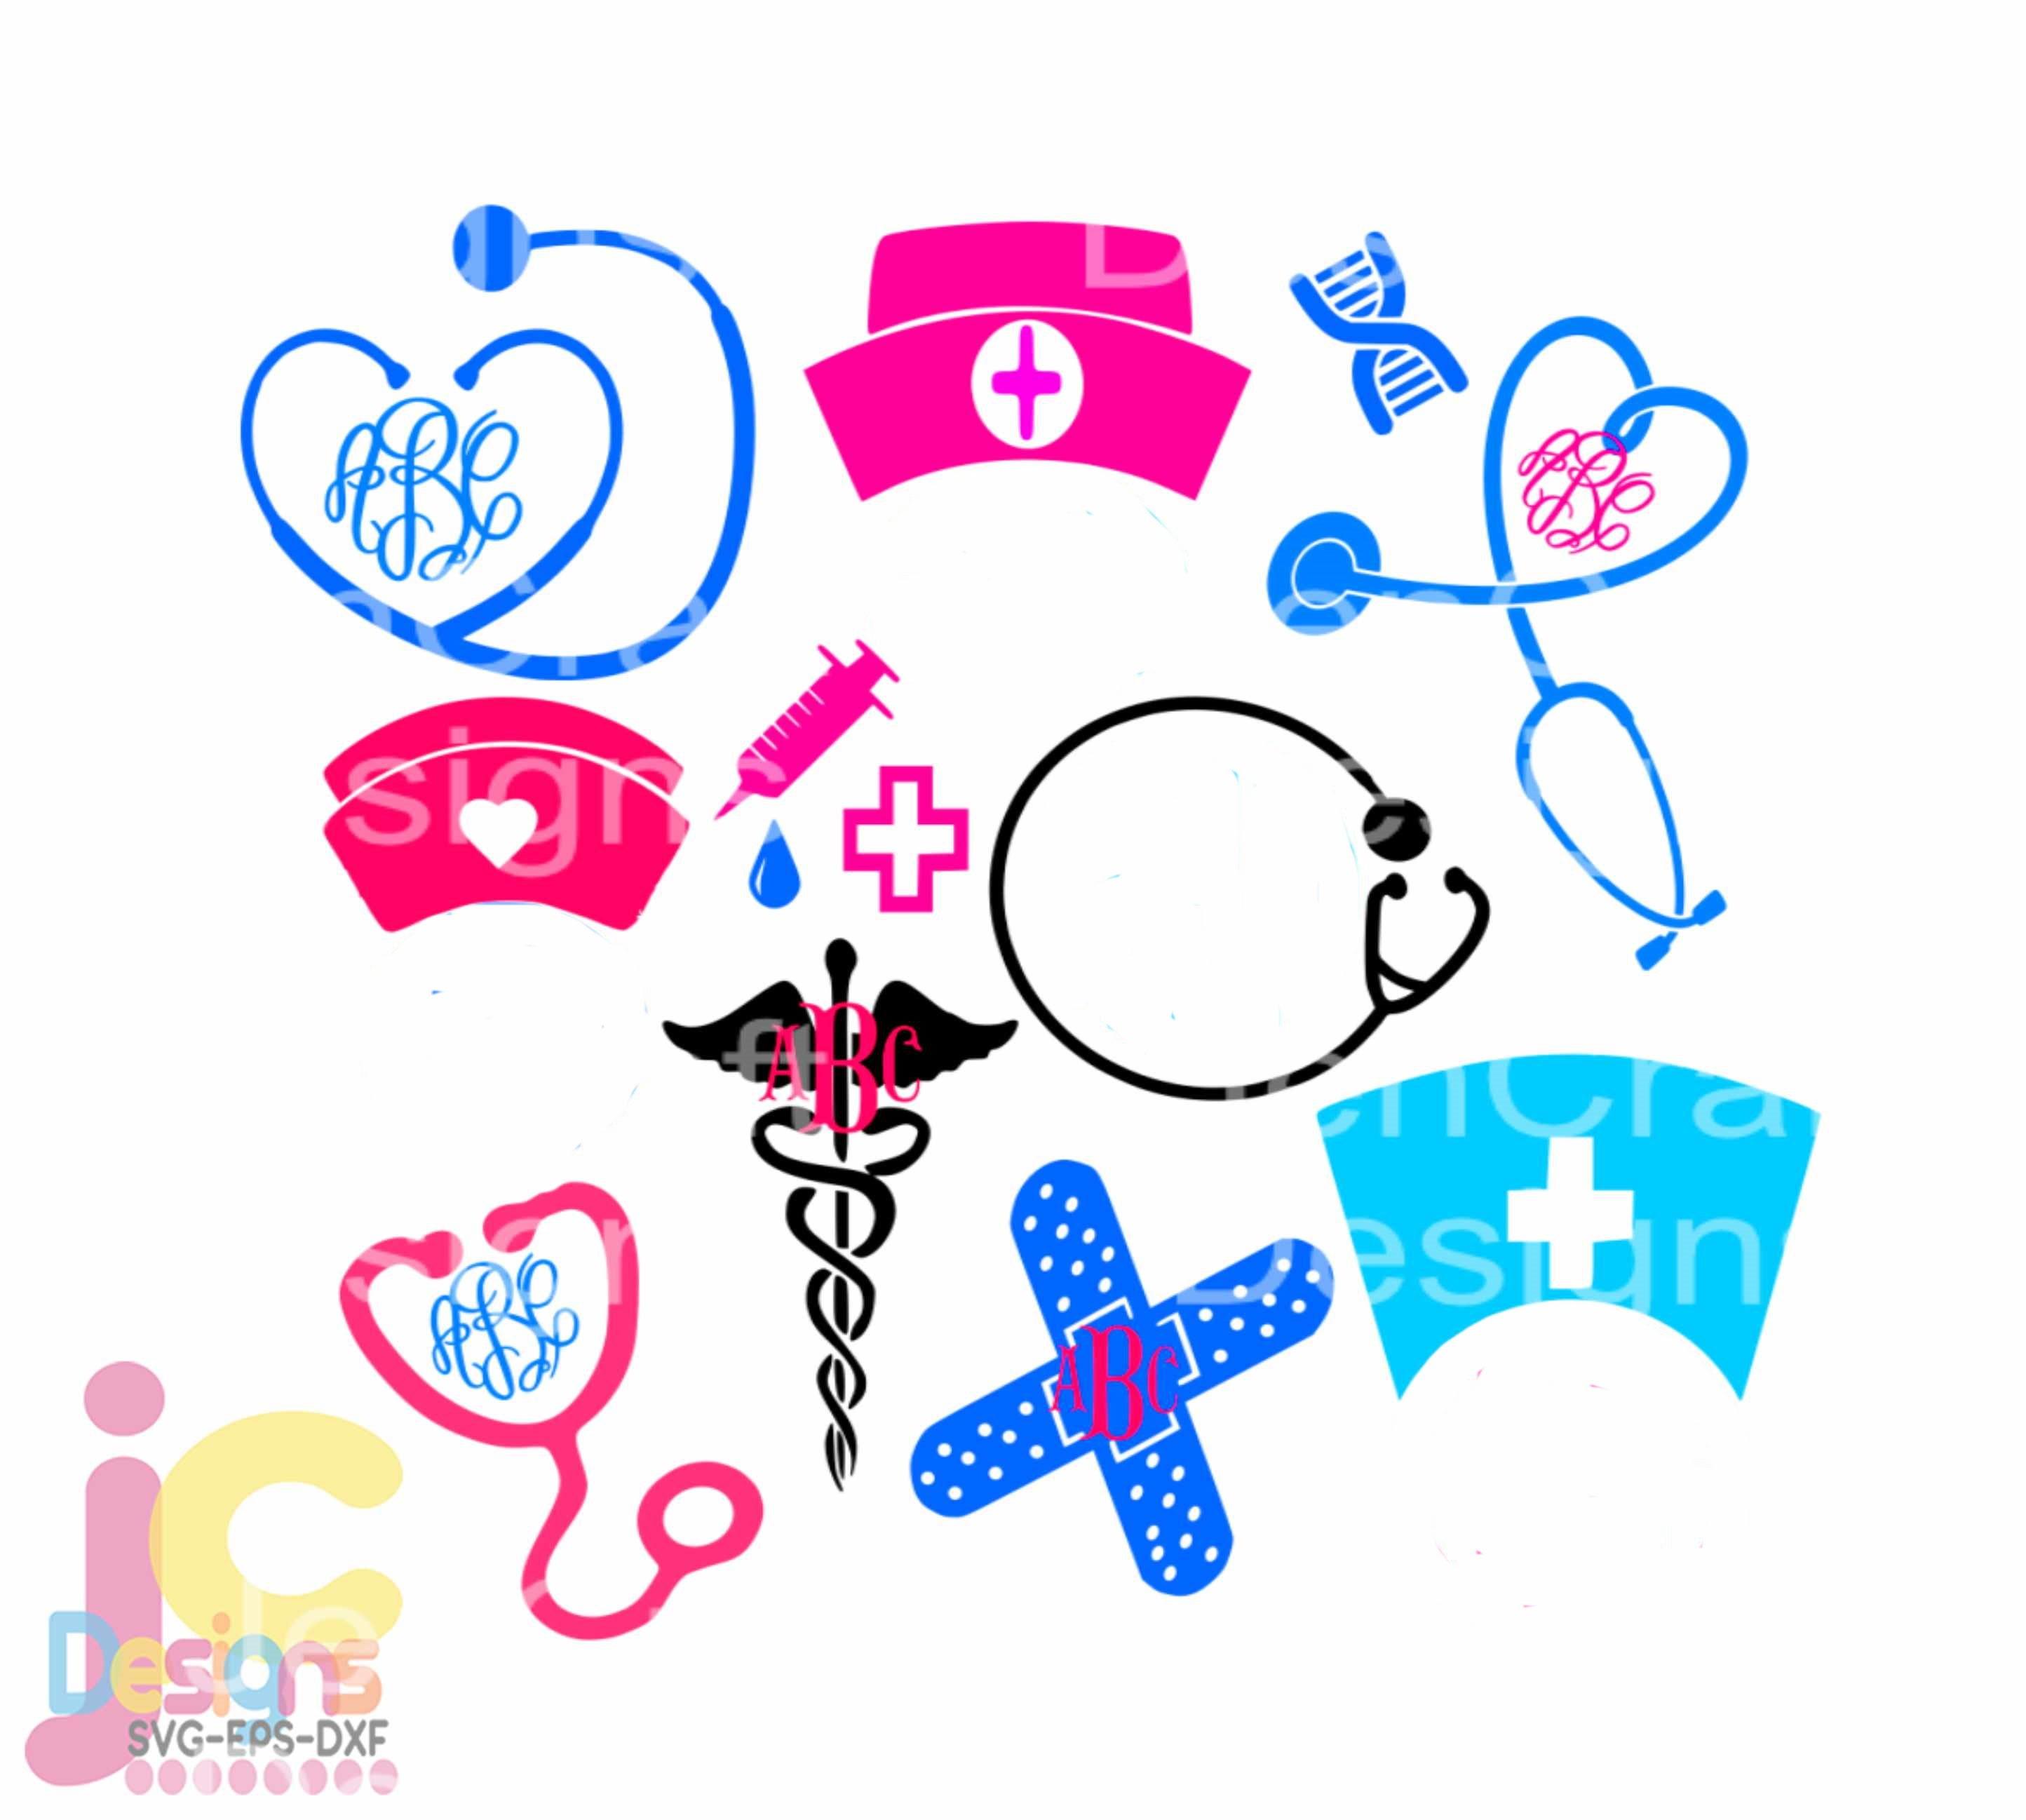 Nurse Svg Stethoscope Svg Nursing Life Svg Rn Svg Eps Png Dxf Shirt Design Cricut Design Space Silhouette Digital Cut Files